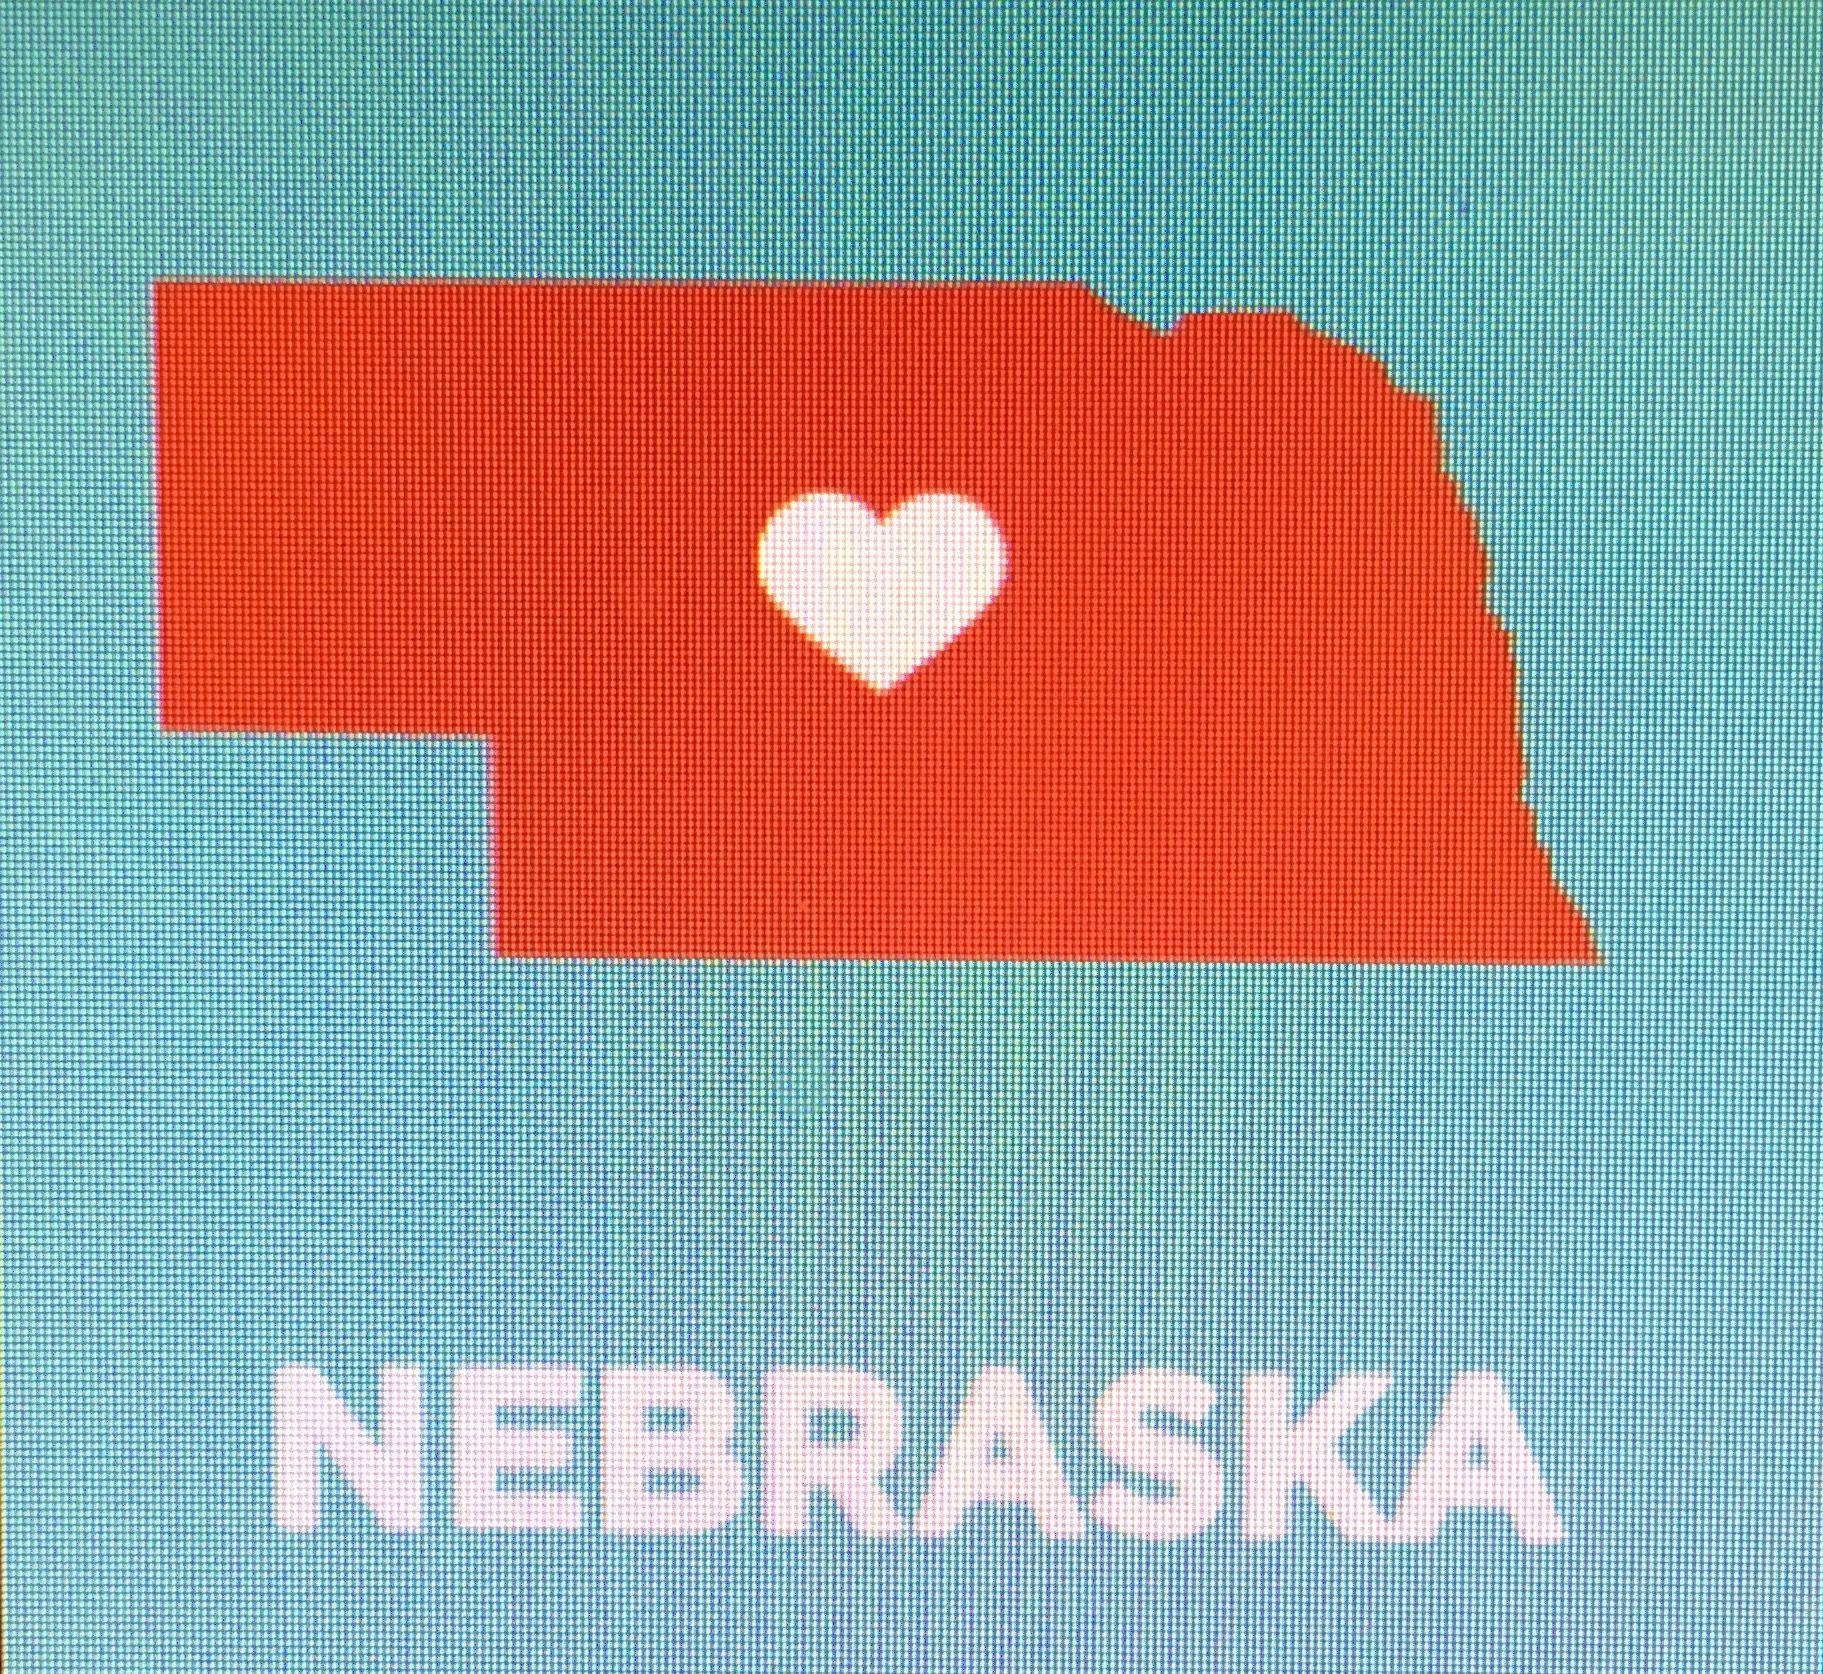 Hello To Nebraska! I Want To Let All My Friends & Family